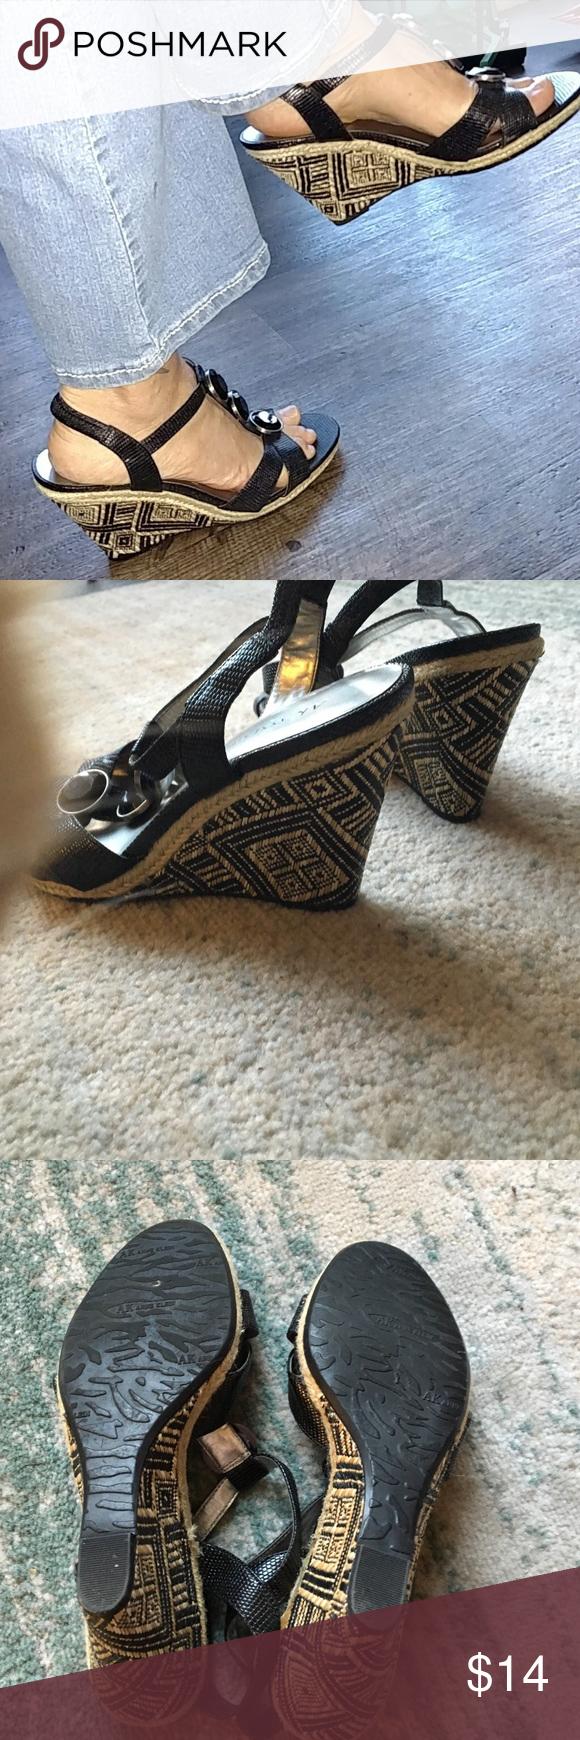 Ann Klein sandals Comfy elastic backs. Neat black design pattern.  AK Venture Anne Klein Shoes Sandals